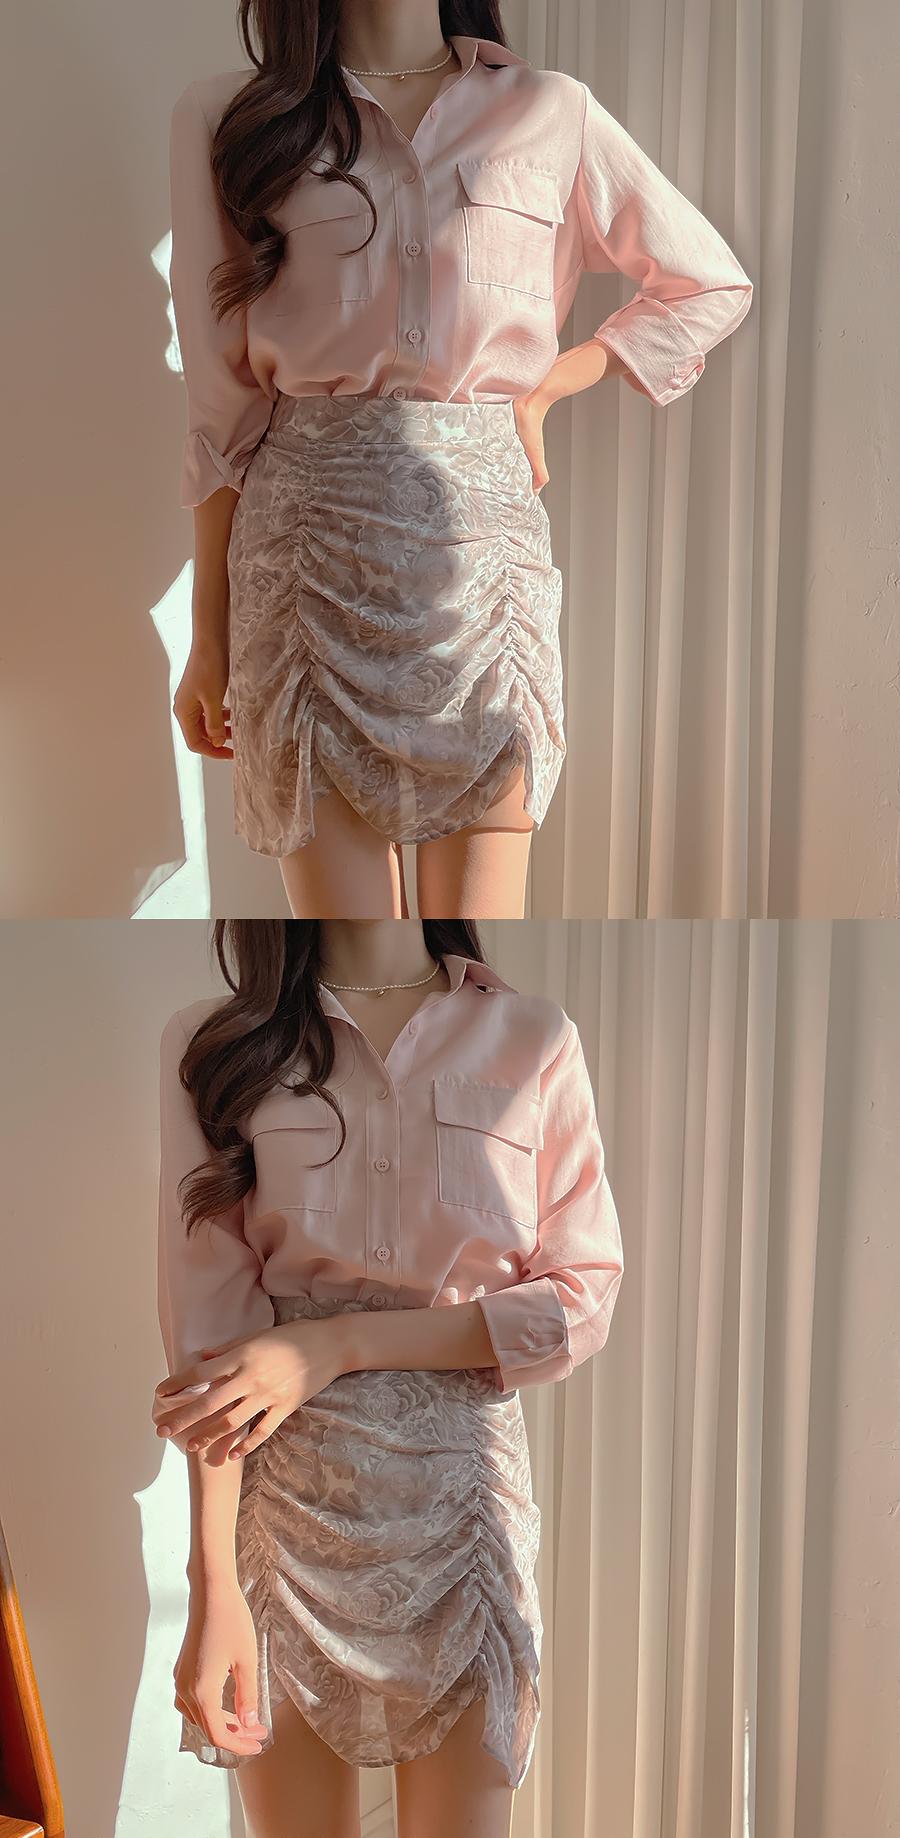 Peak Shatin Two Pocket Shirt Blouse 4color